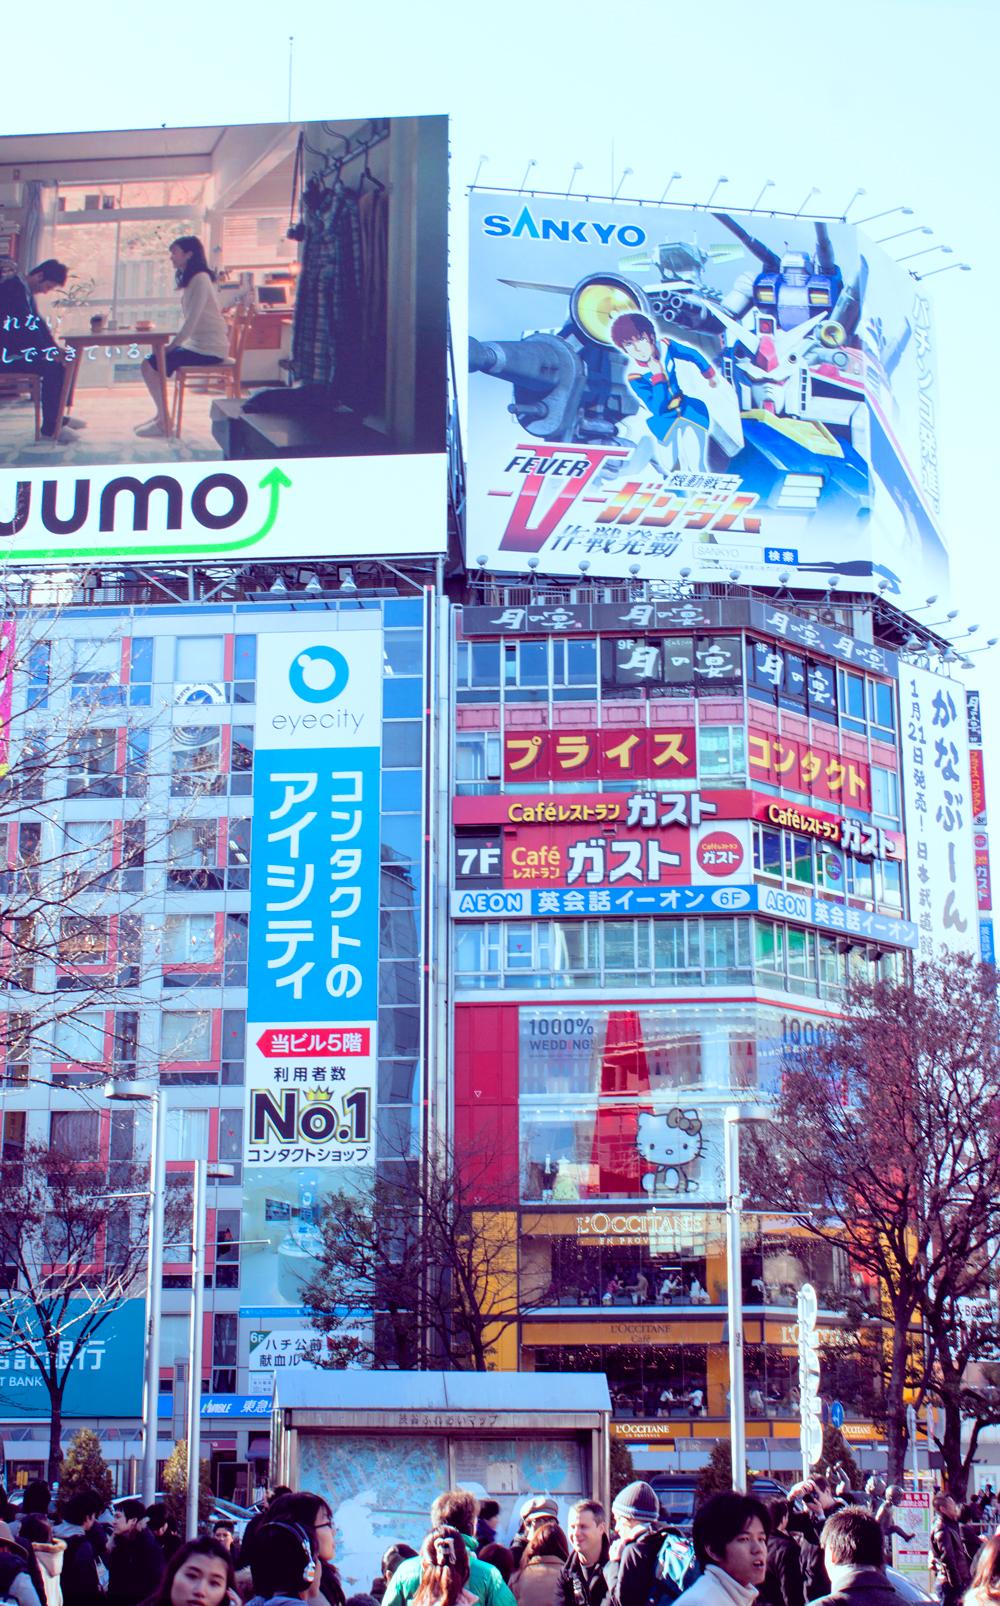 shibuya station, hachiko exit, ,shibuya crossing, shibuya scramble crossing, worlds biggest pedestrian crossing, japan, tokyo, veiled beanie, shibuya